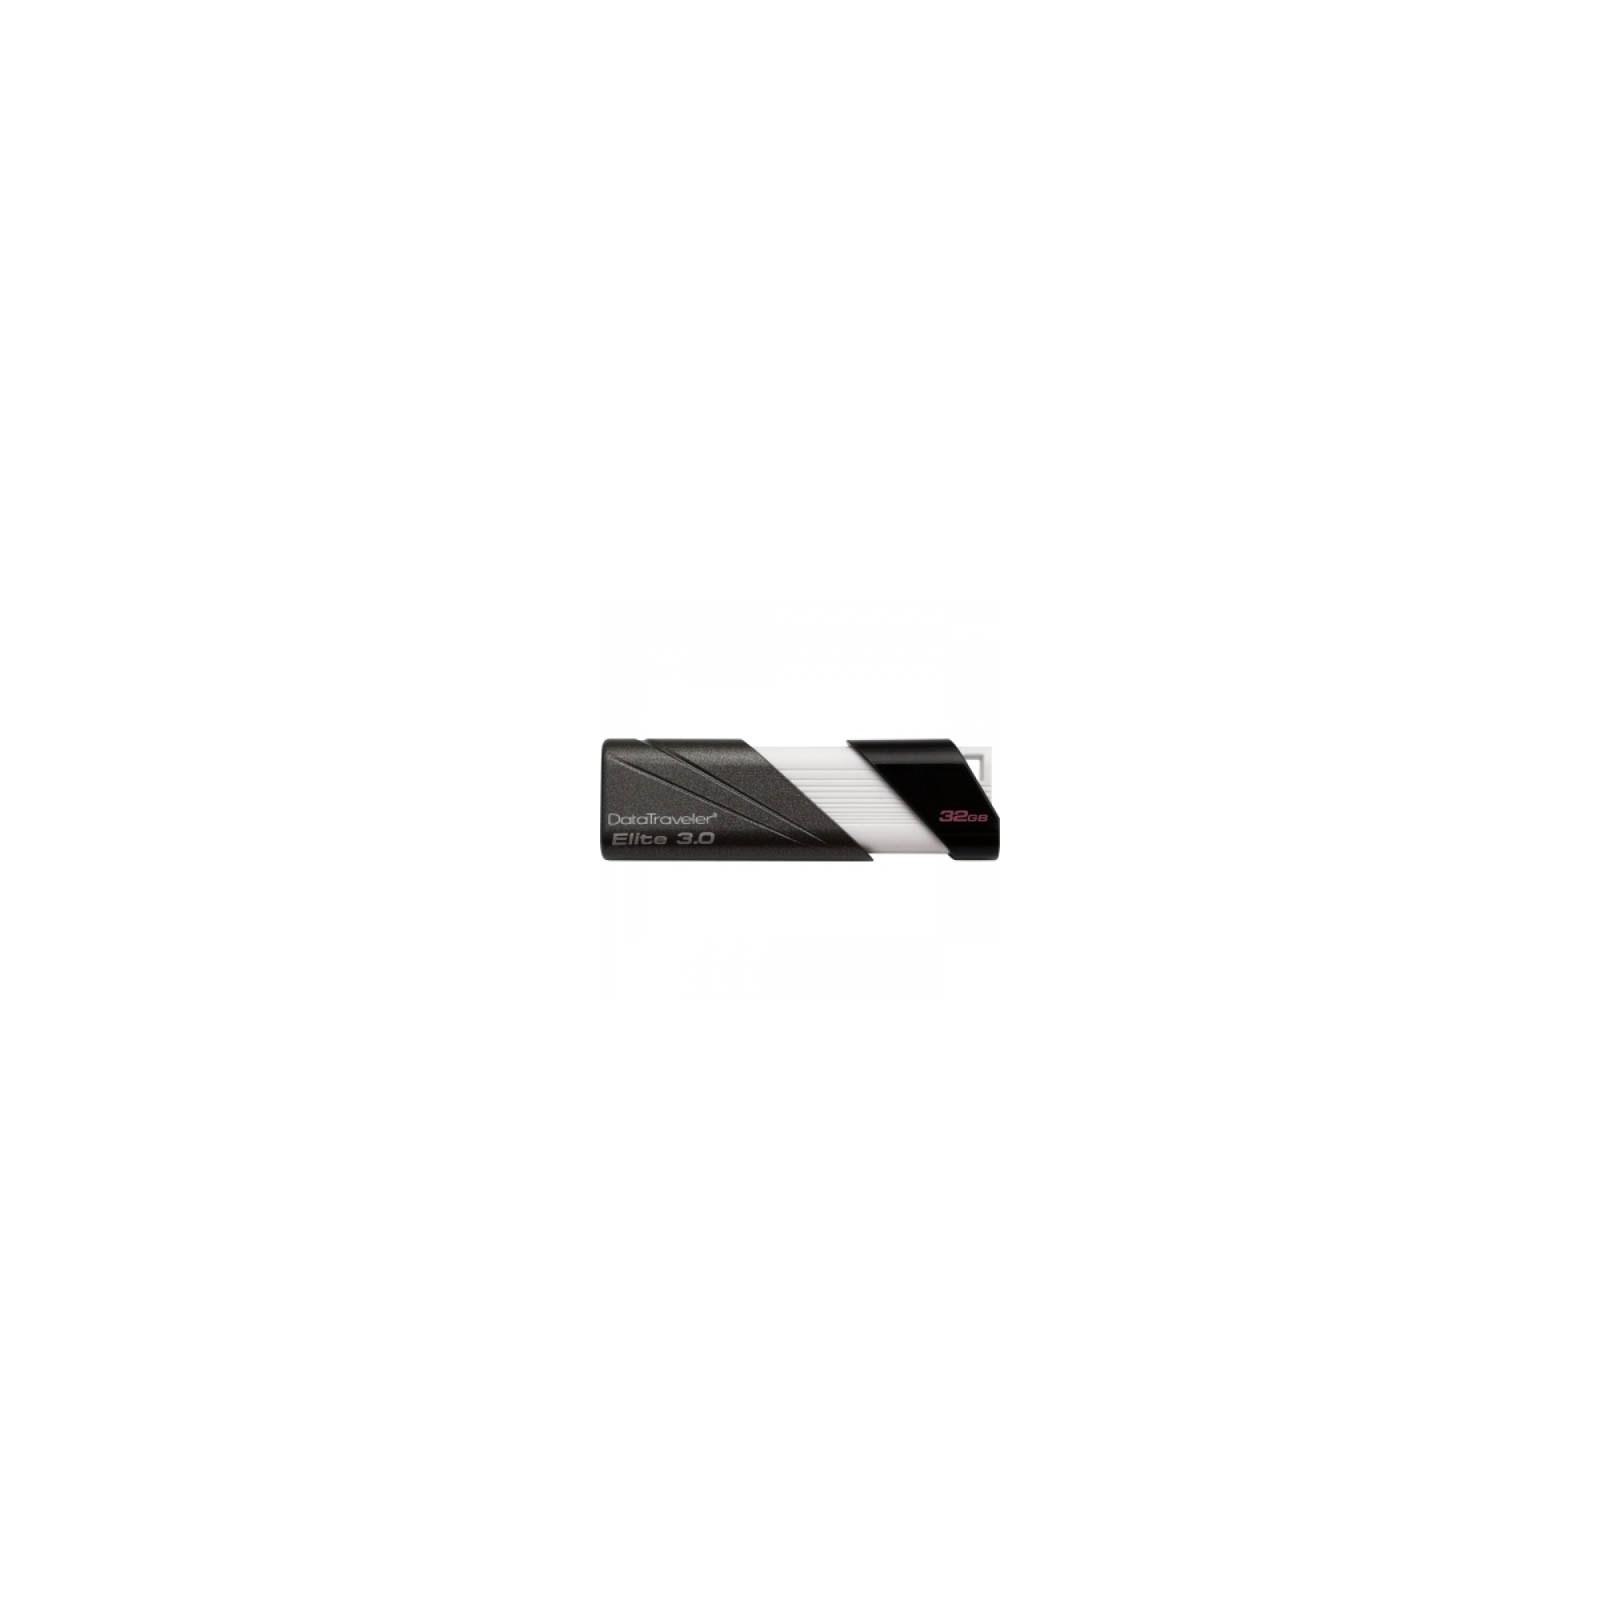 USB флеш накопитель Kingston 32Gb DataTraveler Elite (DTE30/32GB)